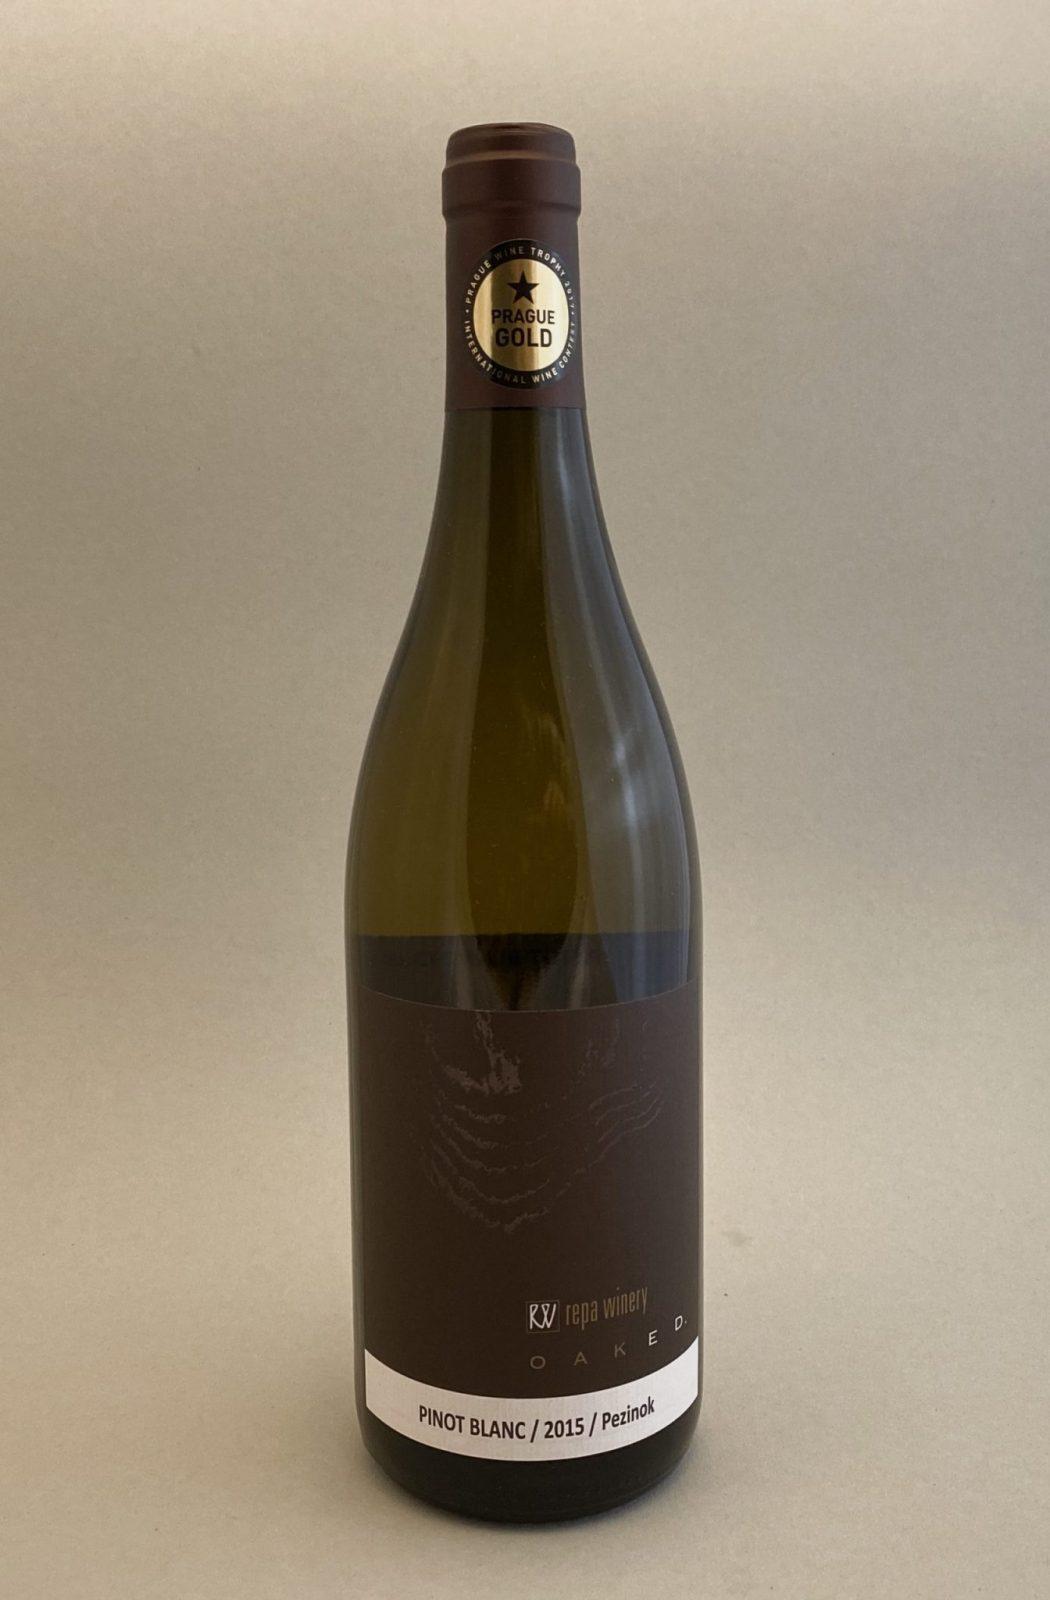 REPA WINERY Pinot Blanc Oaked 2015, vinotéka v Slnečniciach, slovenské biele víno, Bratislava Petržalka, Sunny Wines